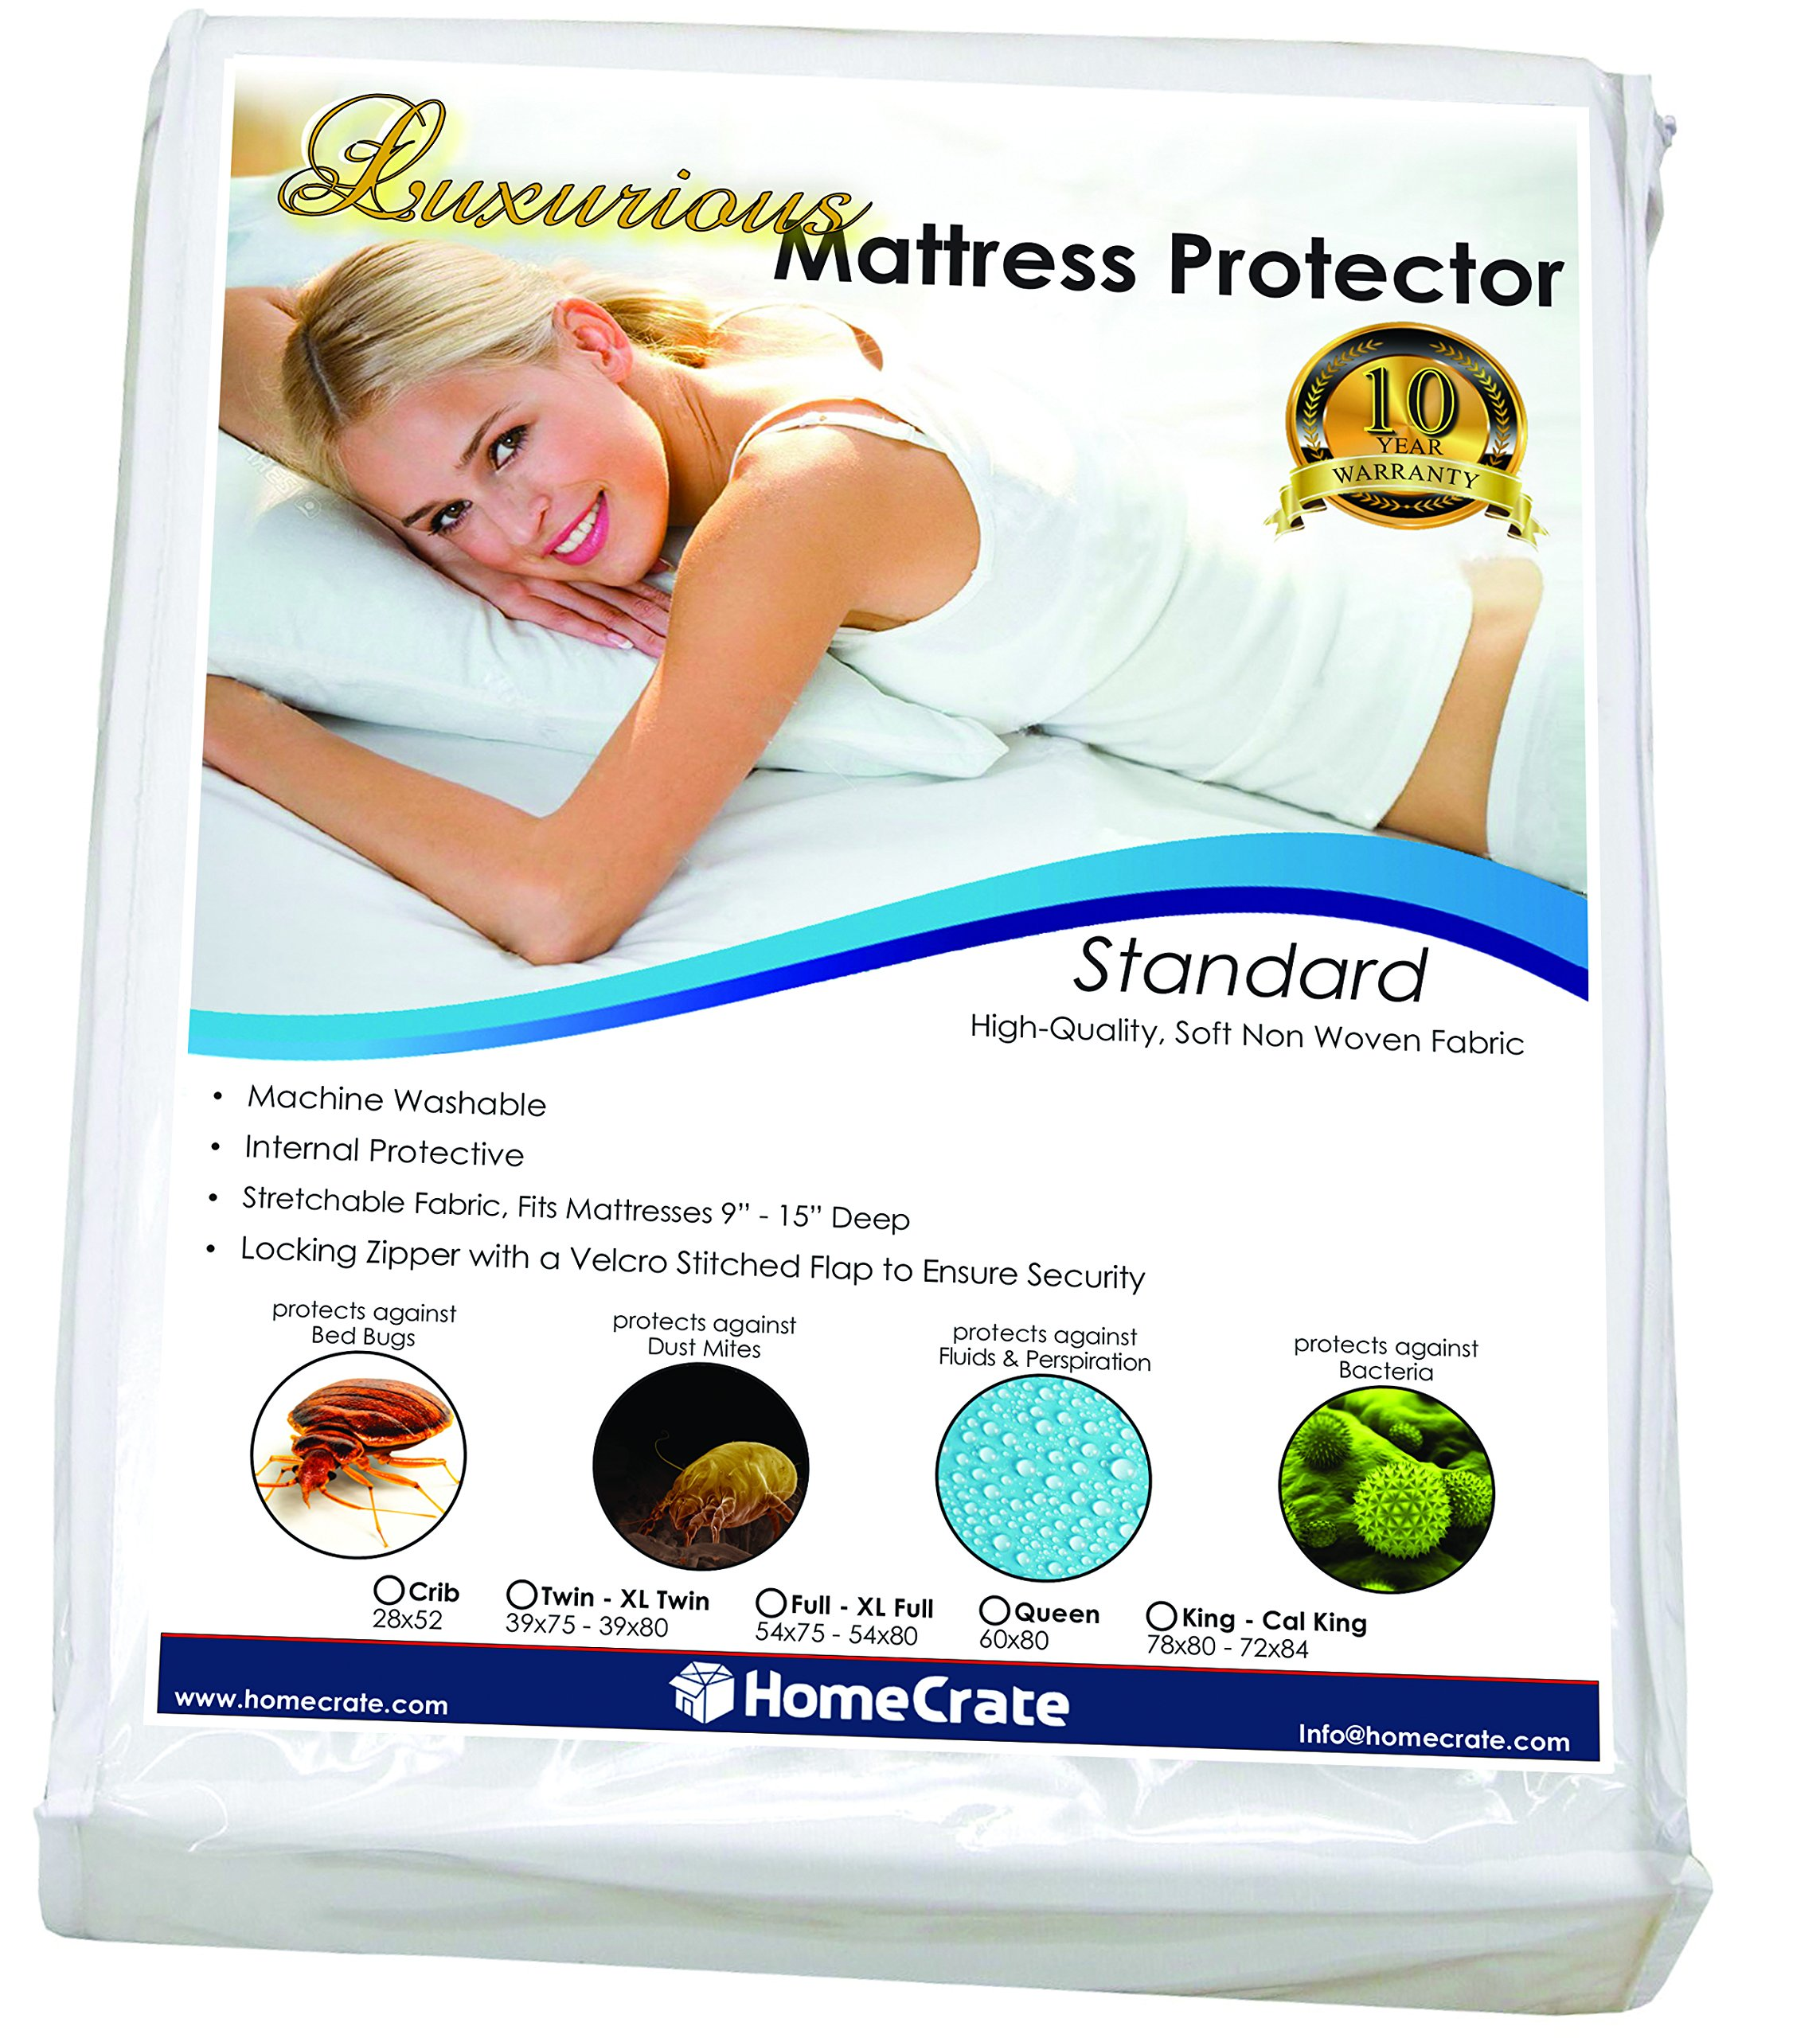 HomeCrate Natural Sleep Defence - Standard Water-Resistant/Bed Bug Proof Mattress Encasement 78'' 80' King,